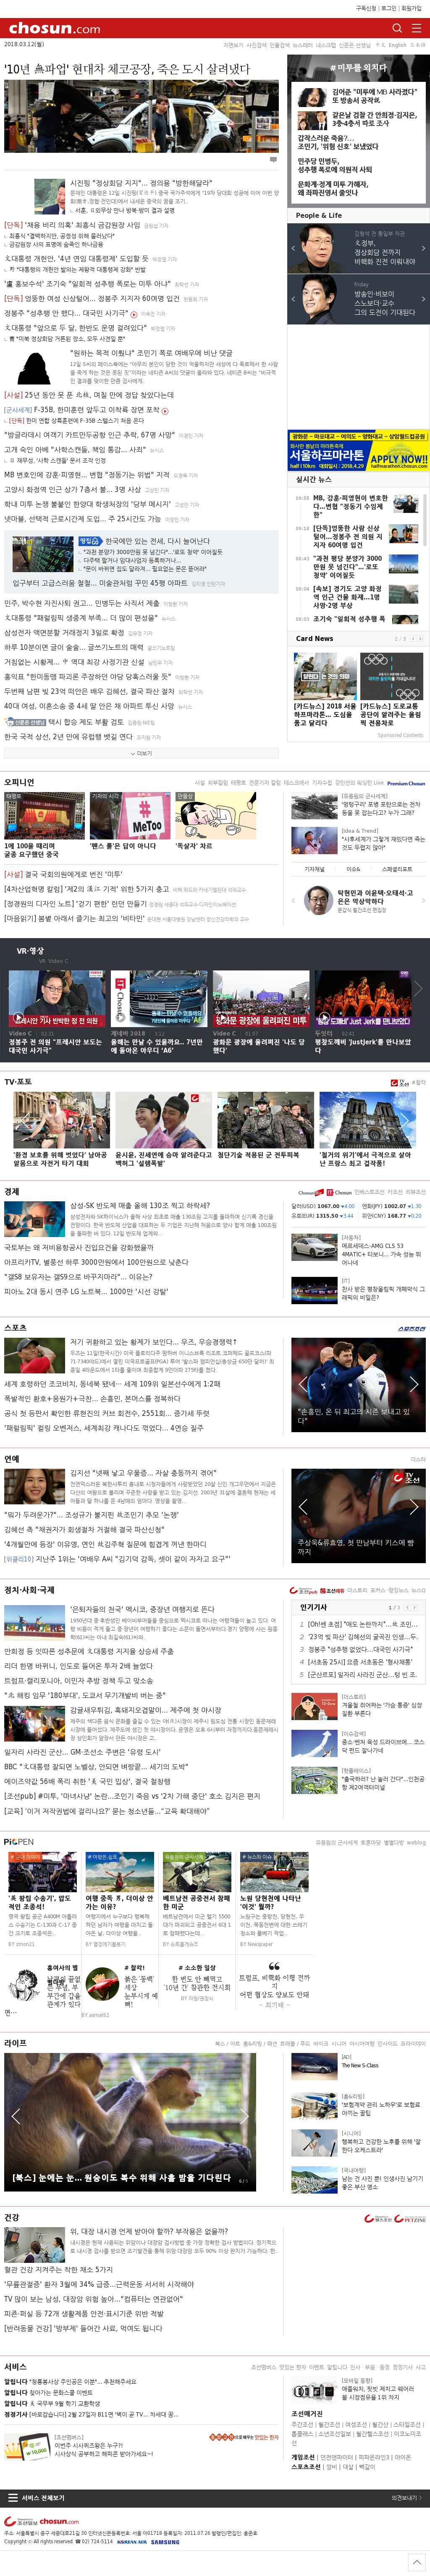 chosun.com at Monday March 12, 2018, 1:03 p.m. UTC